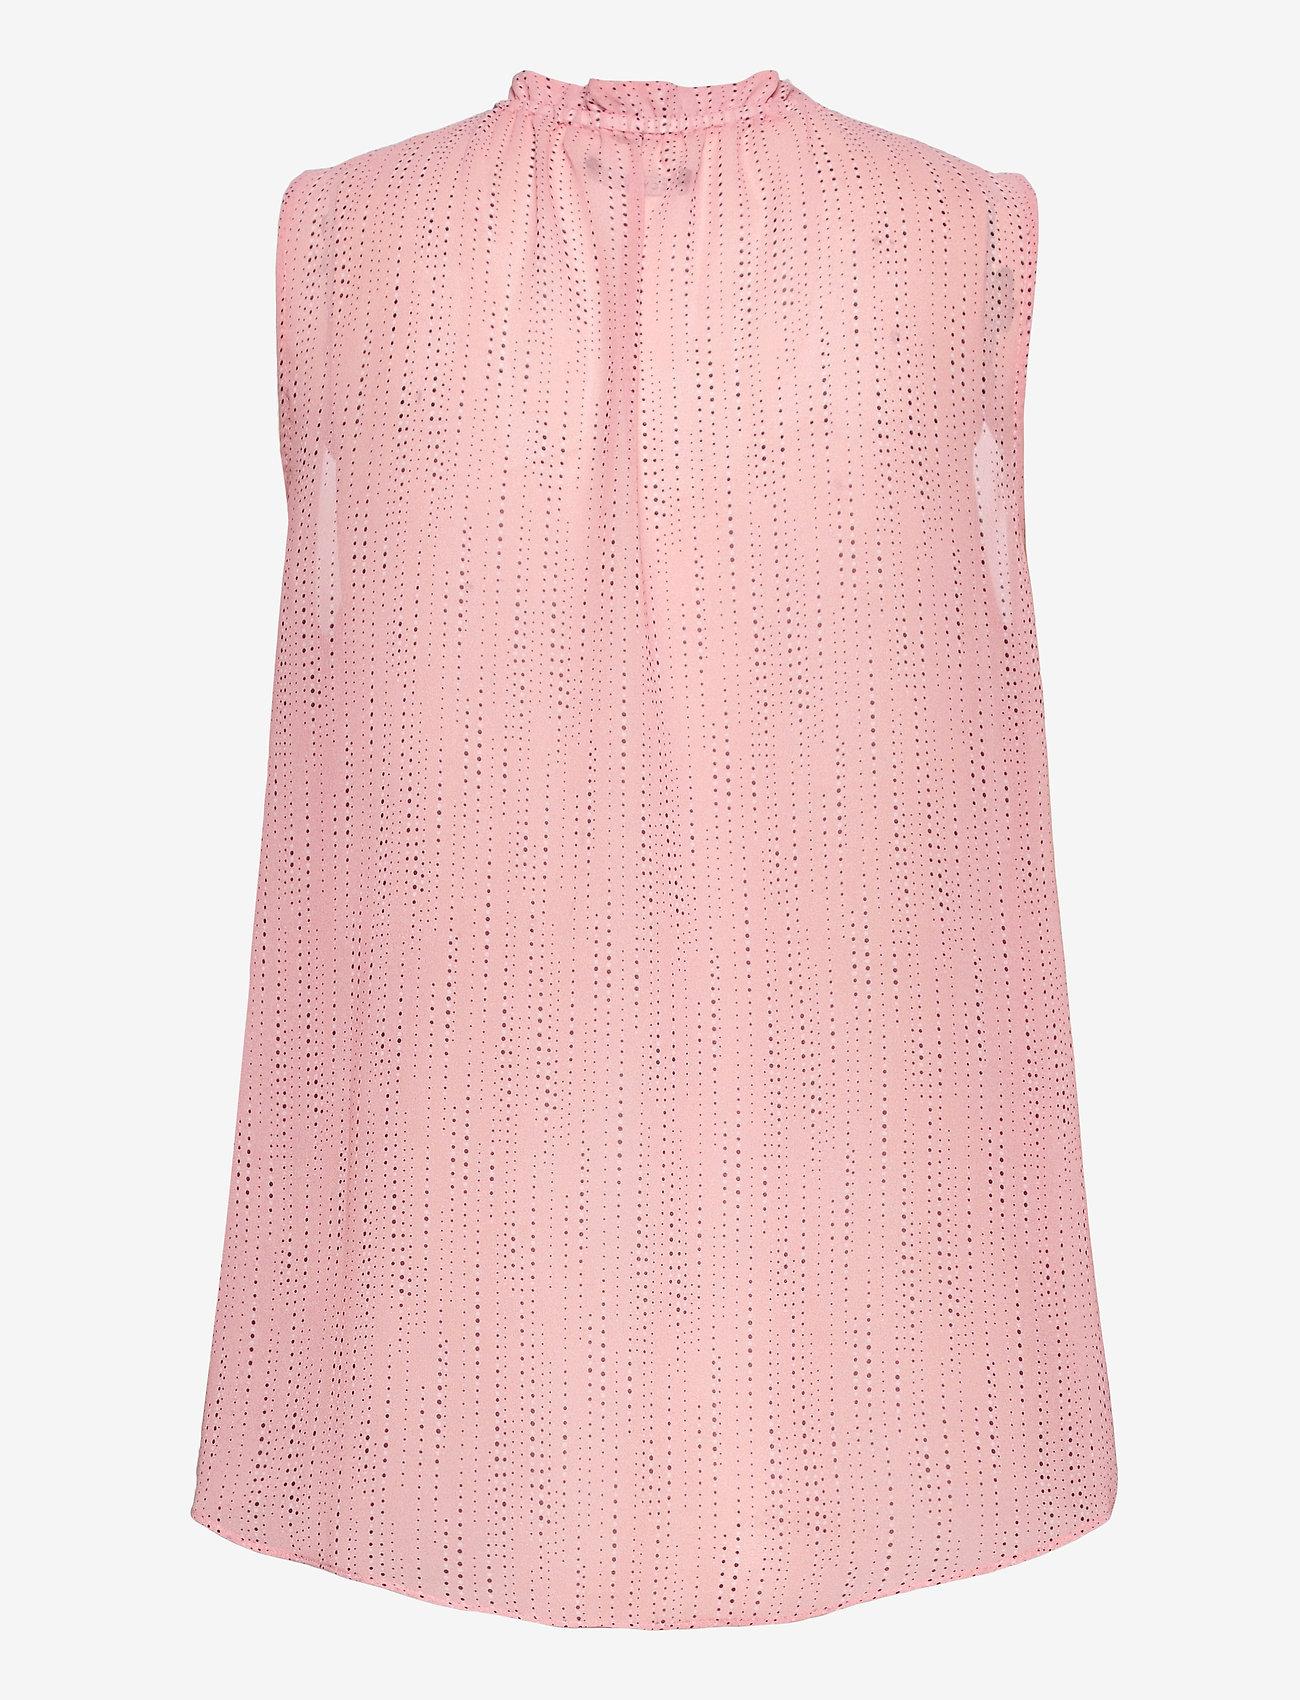 SAND - 3438 - Raya F - blouses zonder mouwen - soft pink - 1